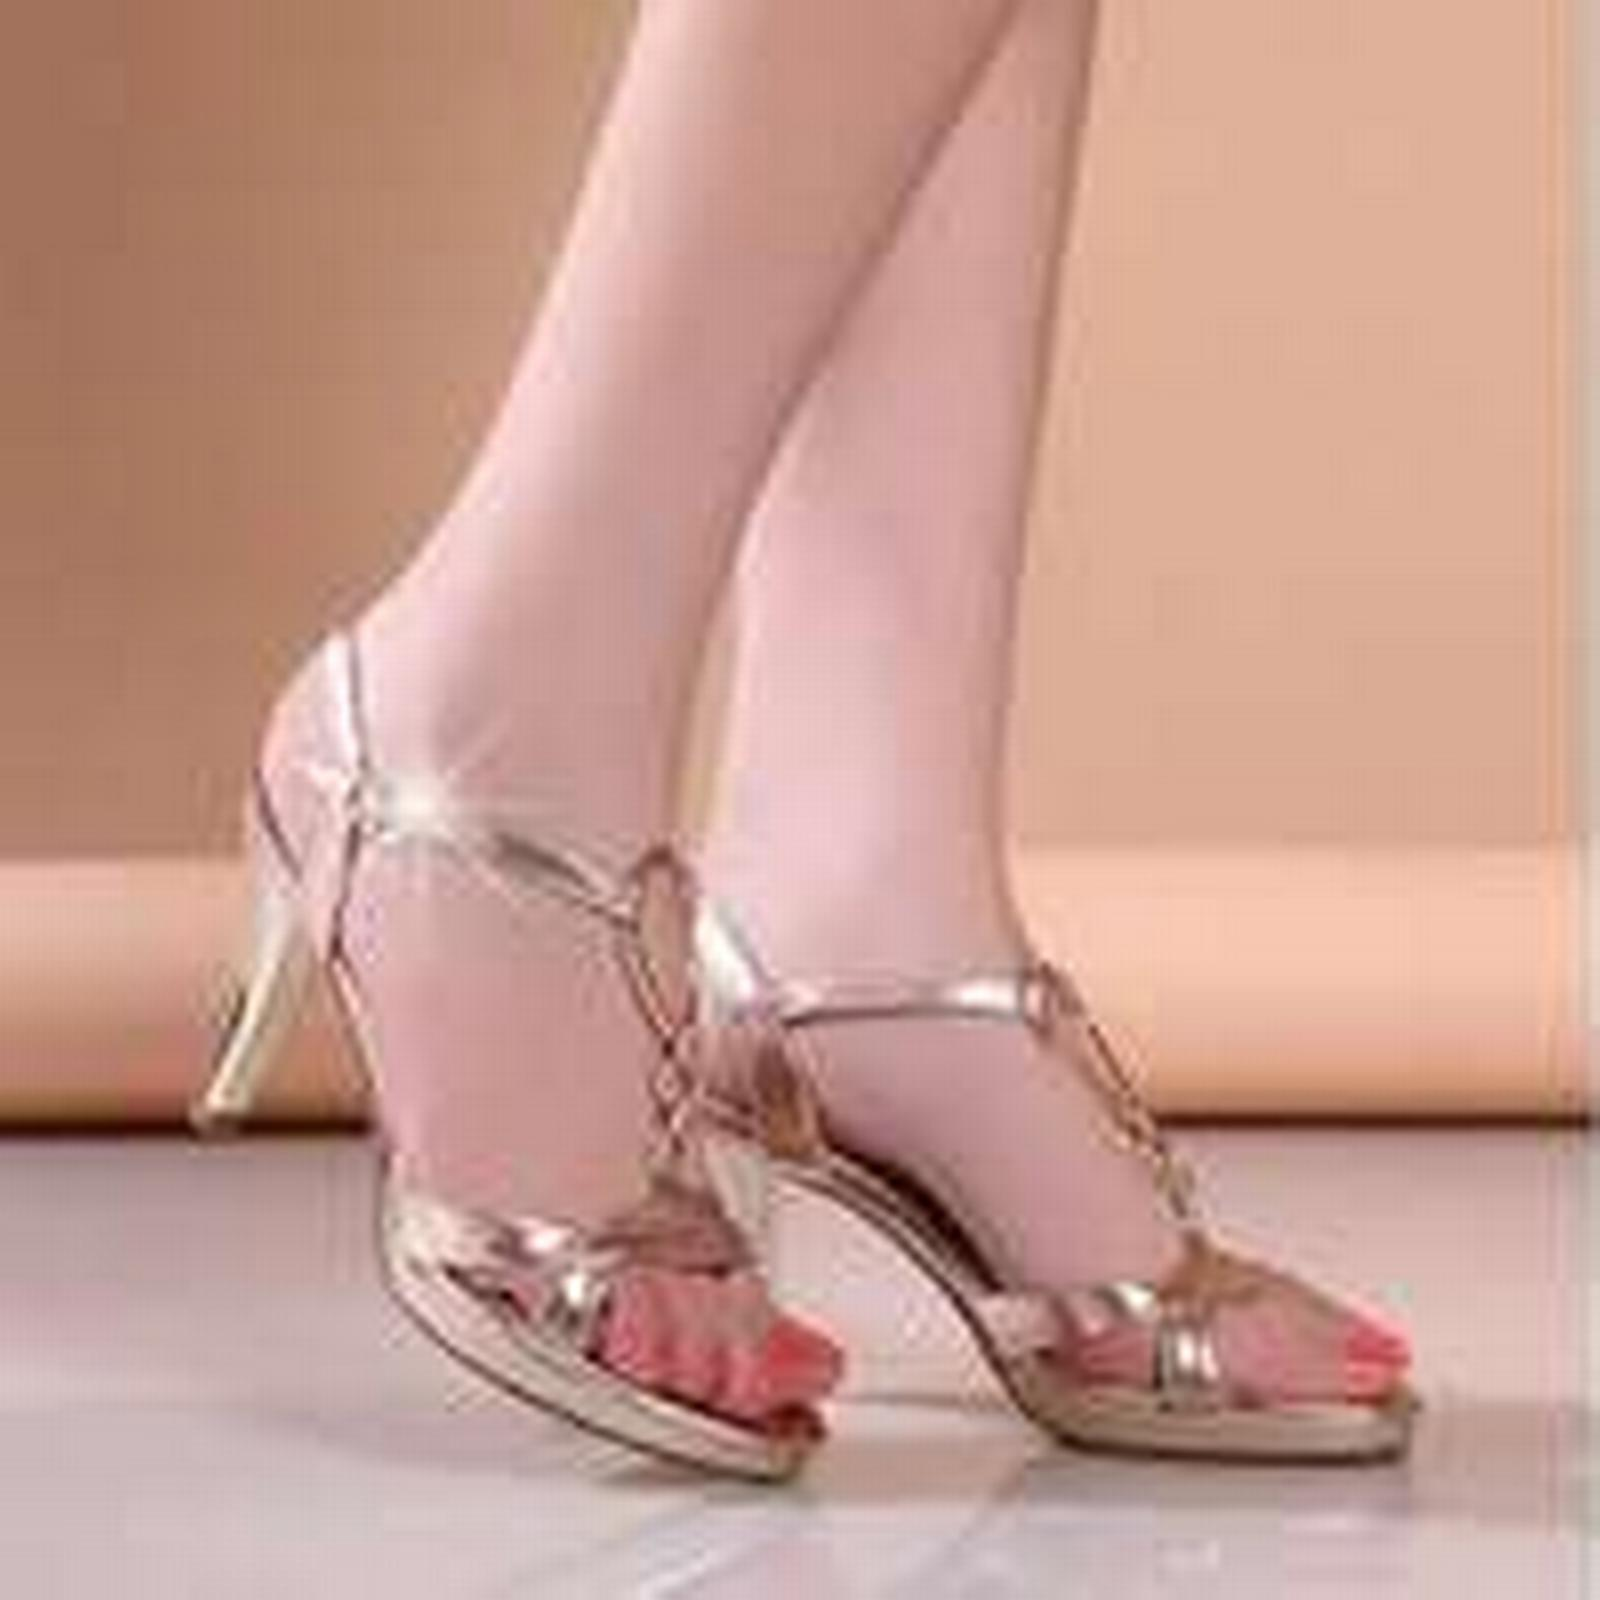 Bonanza (Global) ps358 elegant T-type sandals w 3-9, rhinestones, genuine leather,US Size 3-9, w gold d958df